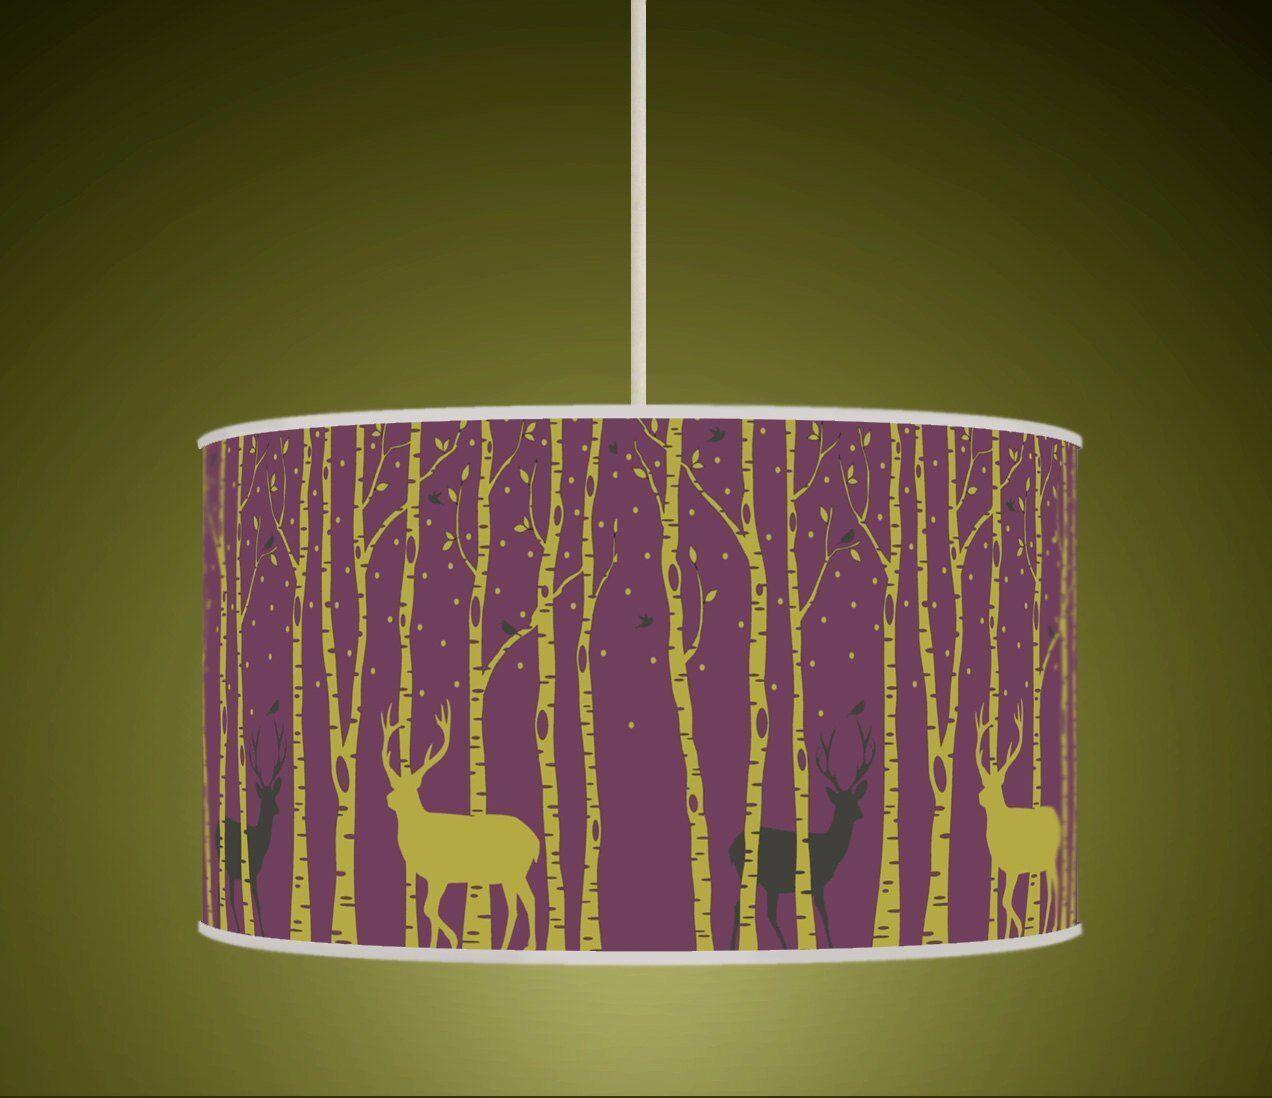 Les arbres prune Stag Cerf prune arbres imprimé rétro vert fait main tissu abat-jour 660 4c4359